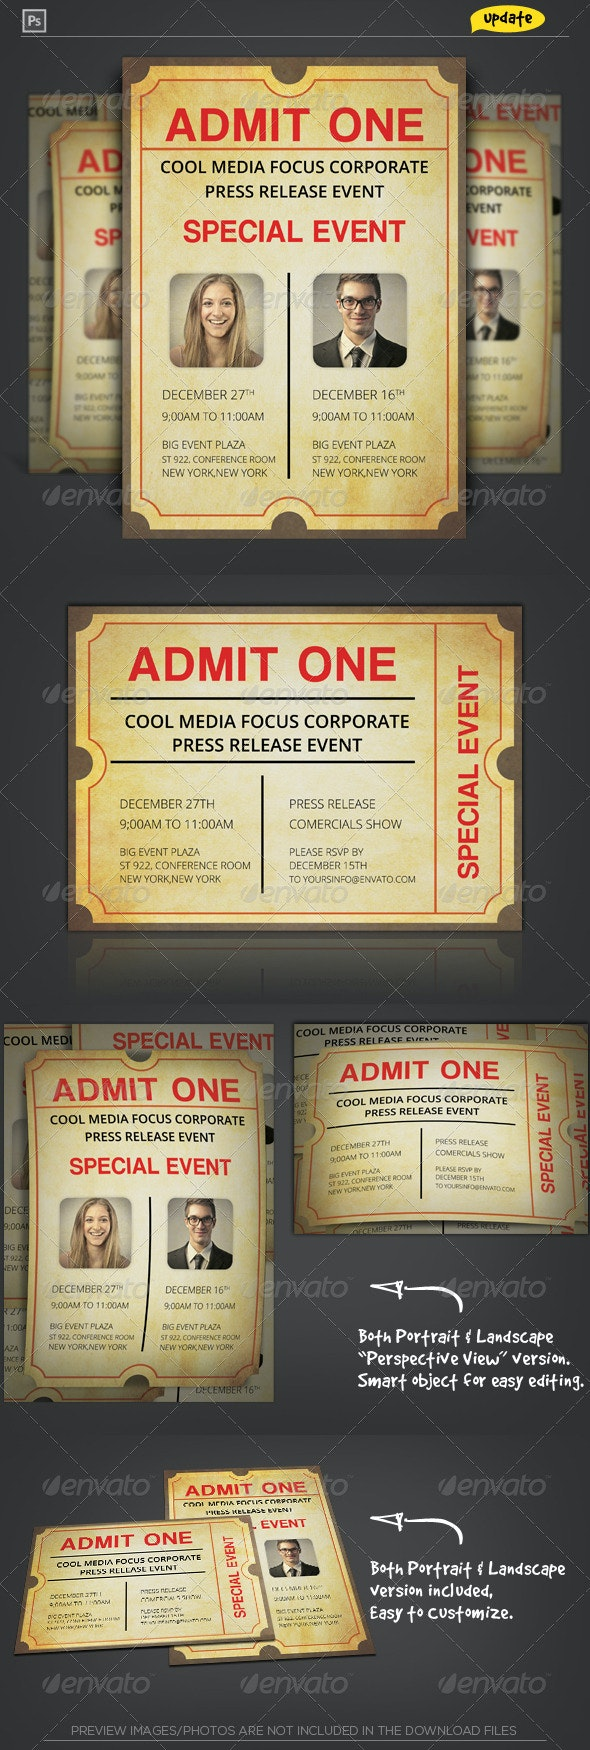 Admit One Ticket Corporate Invitation - Invitations Cards & Invites